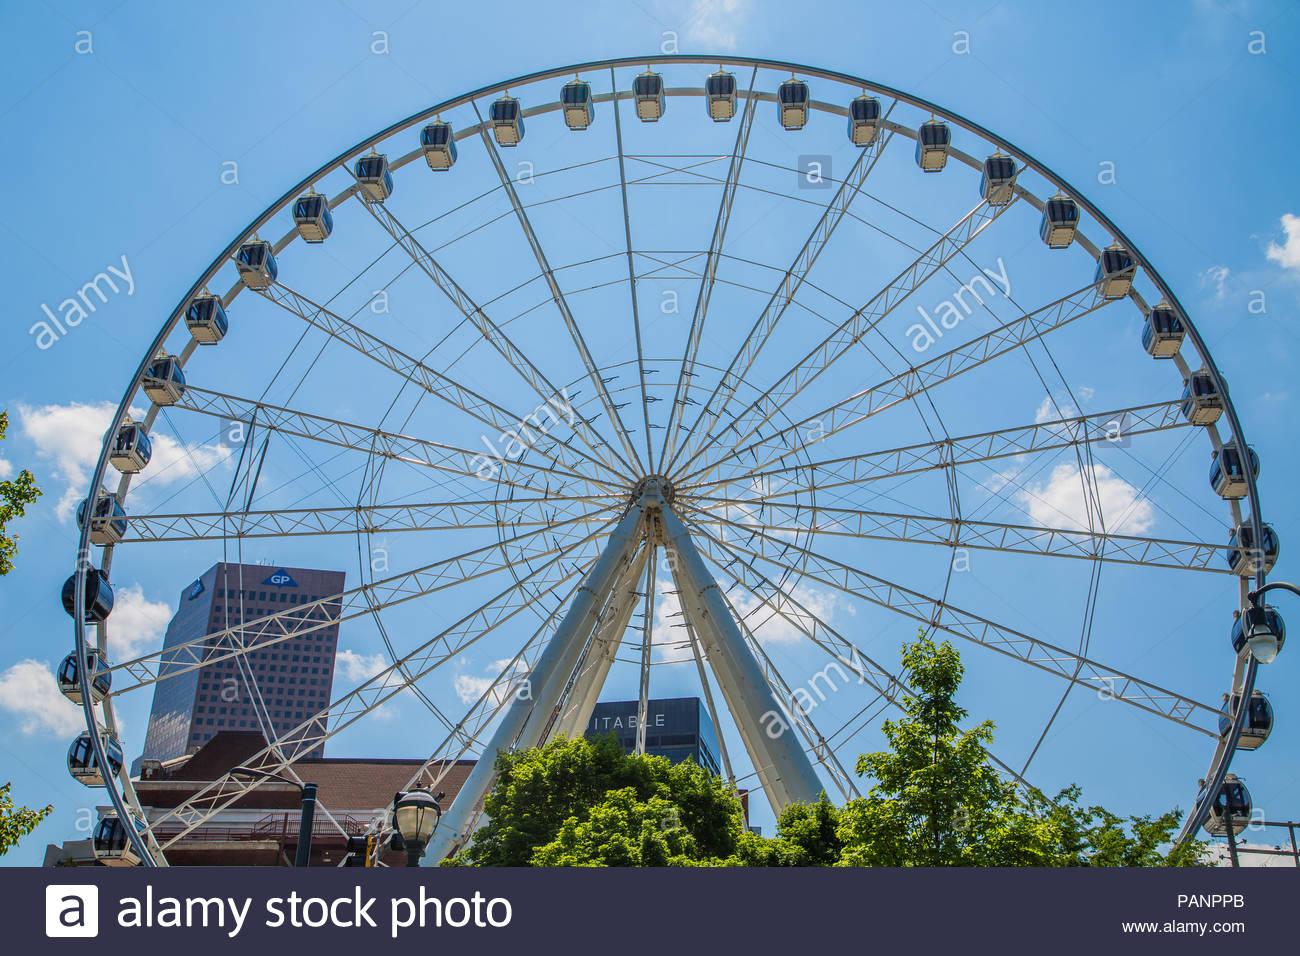 The Ferris Wheel in Atlantas Centennial Olympic Park with 1300x956